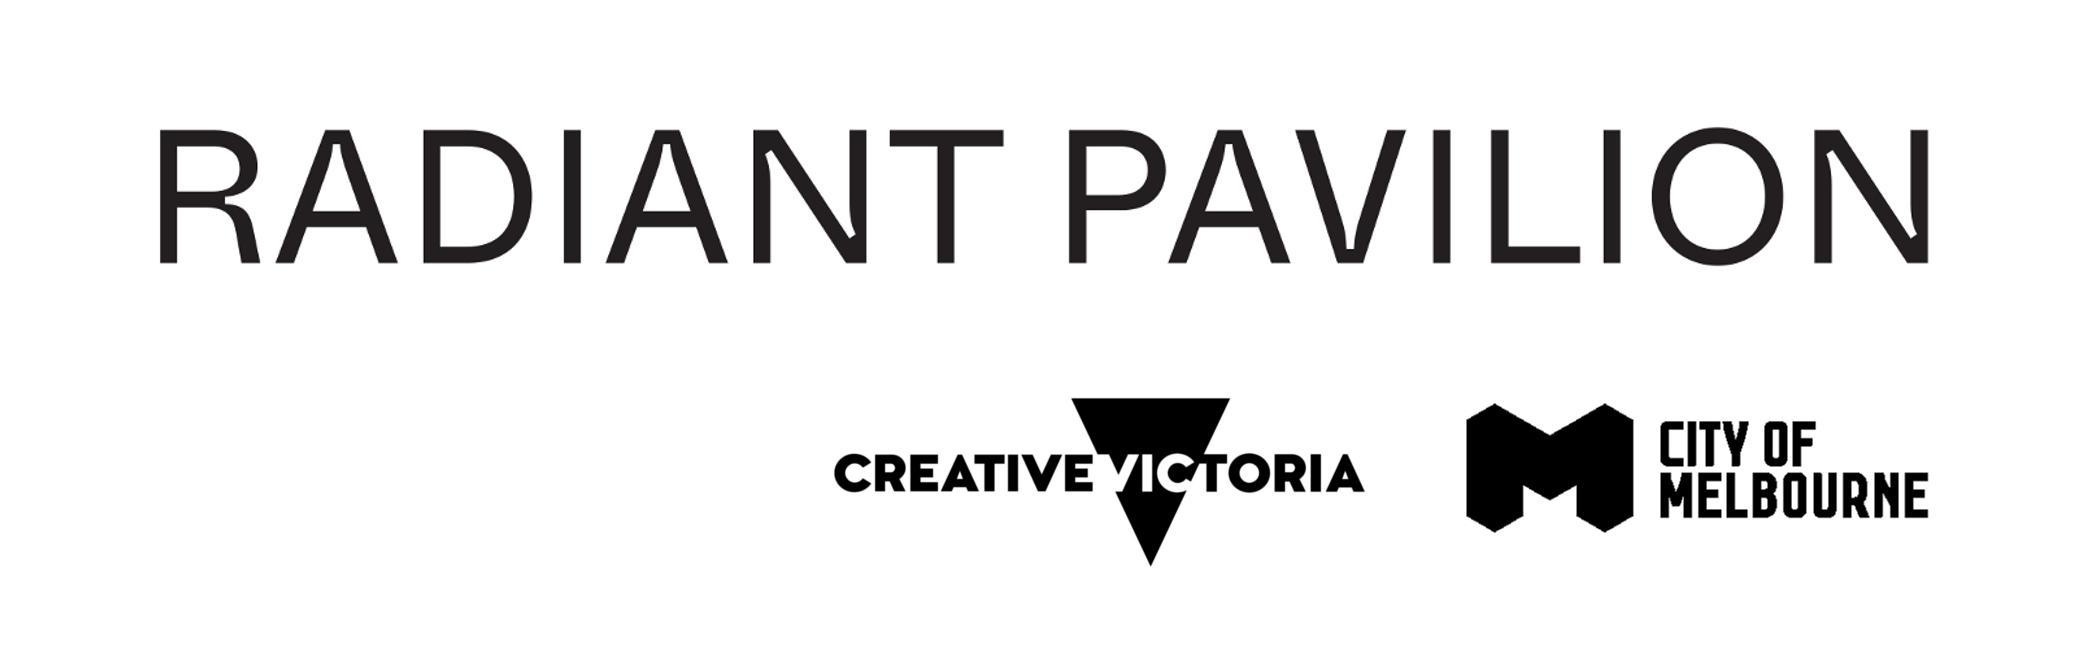 RadiantPavilion2019_logo (002).jpg